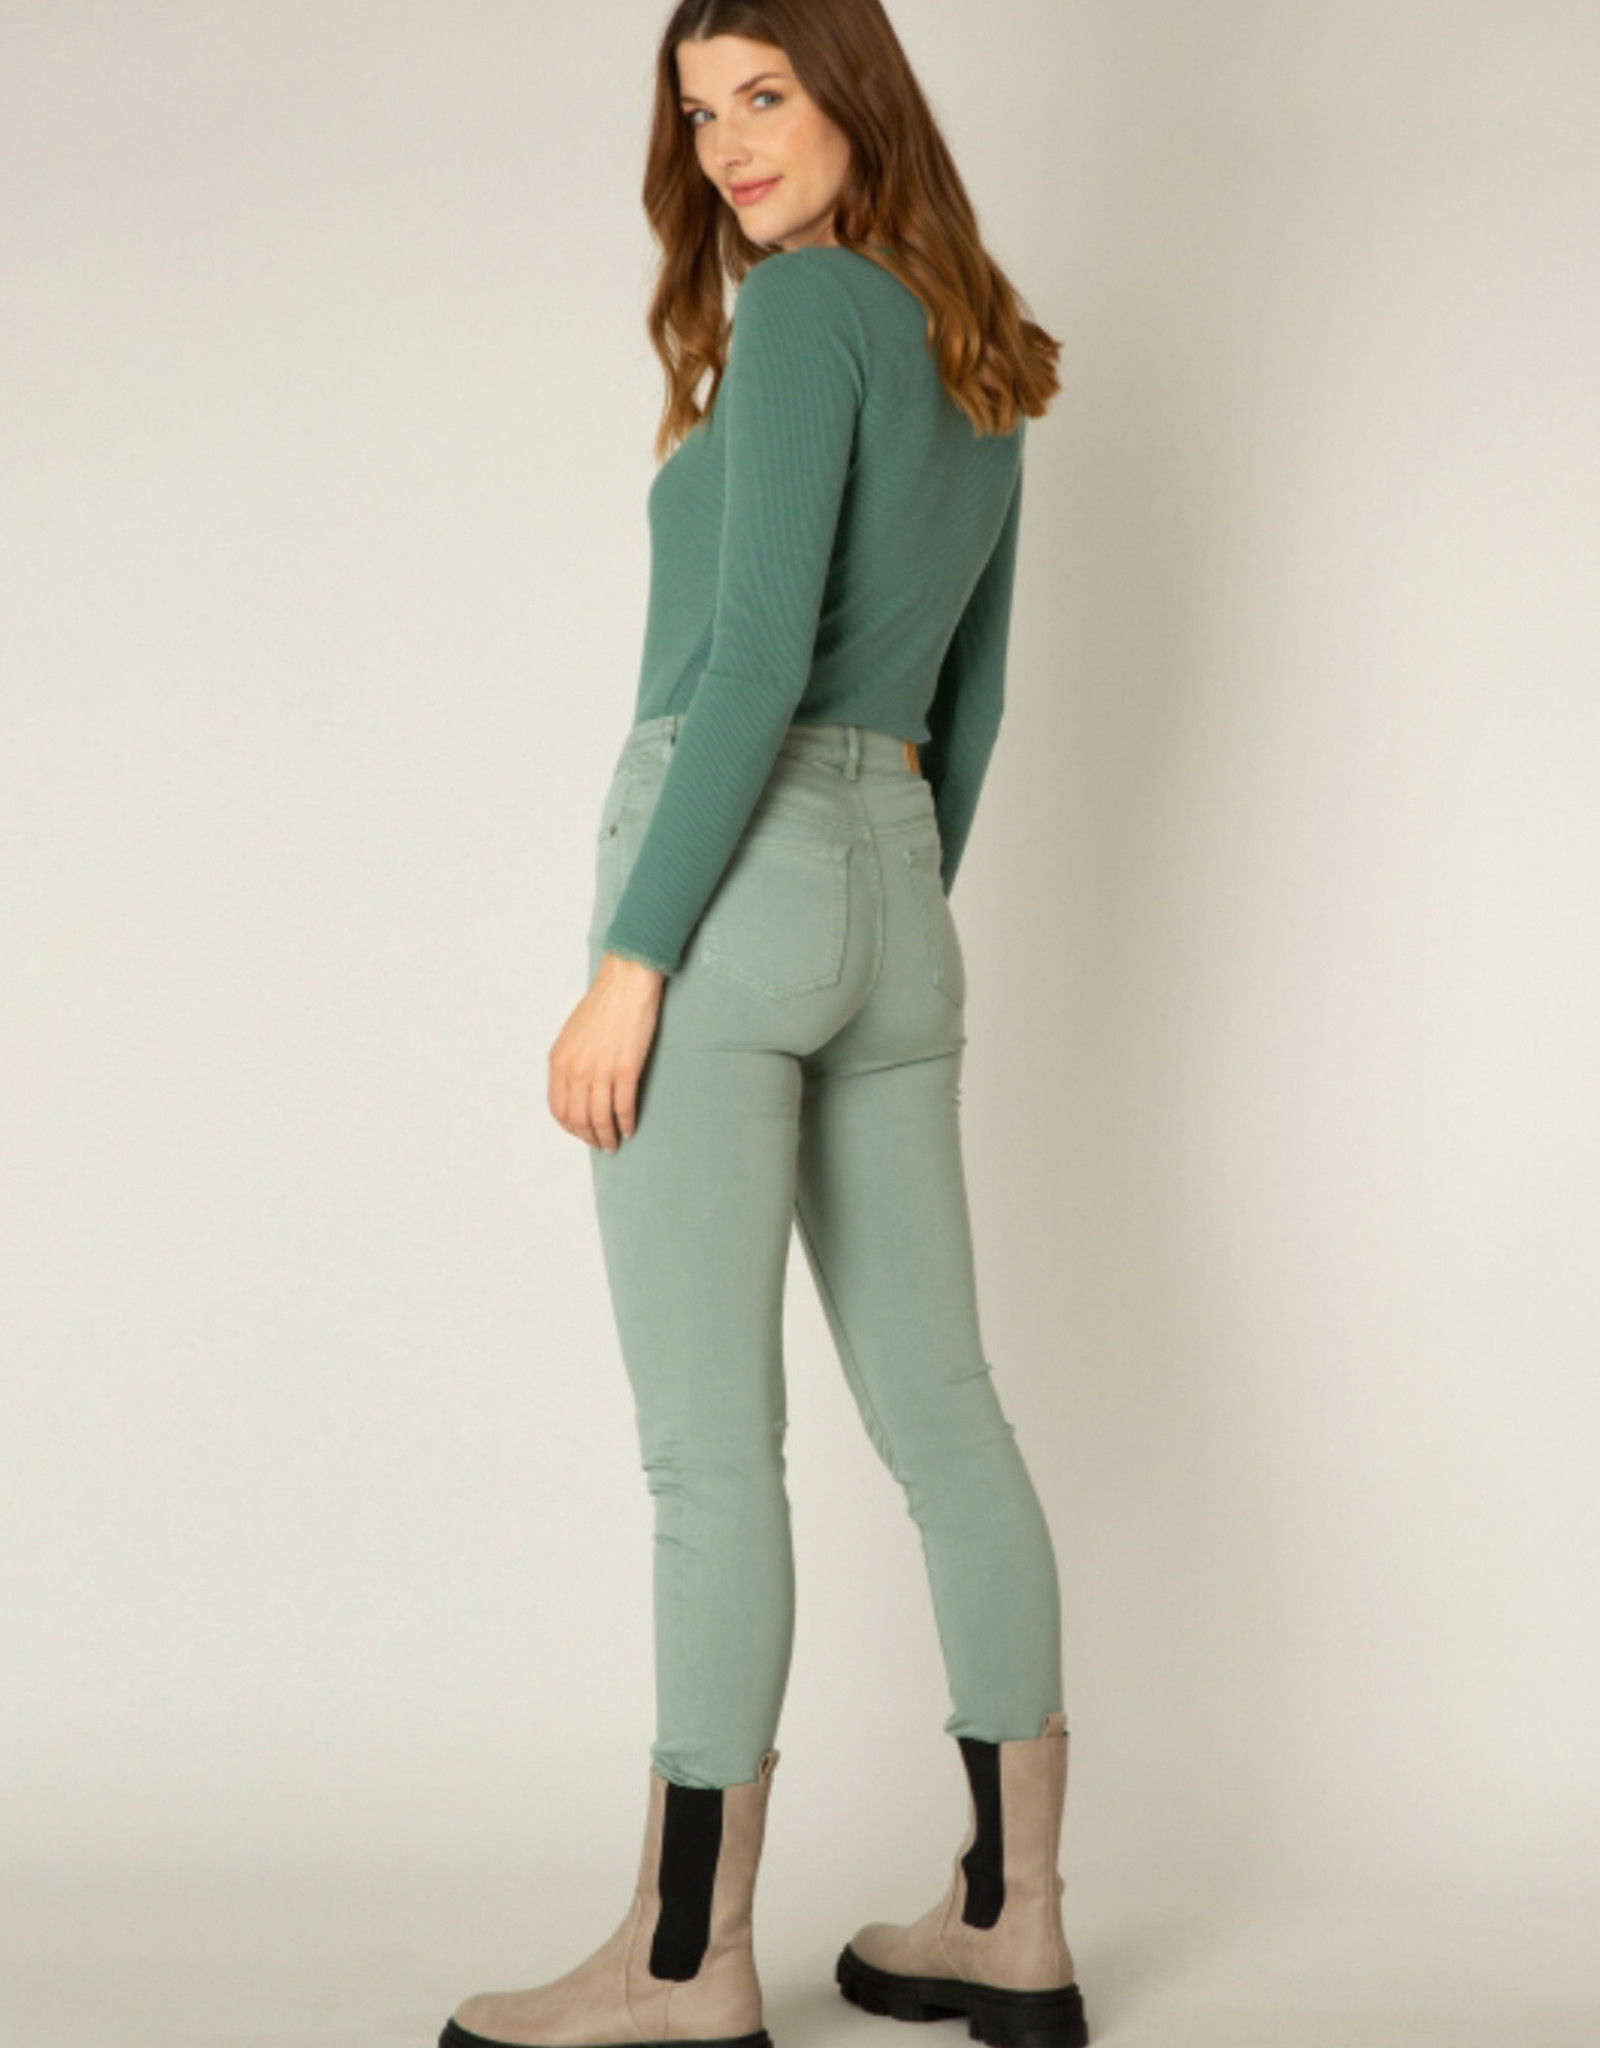 Yest Yest 2187 Mell Slim Fit Pants